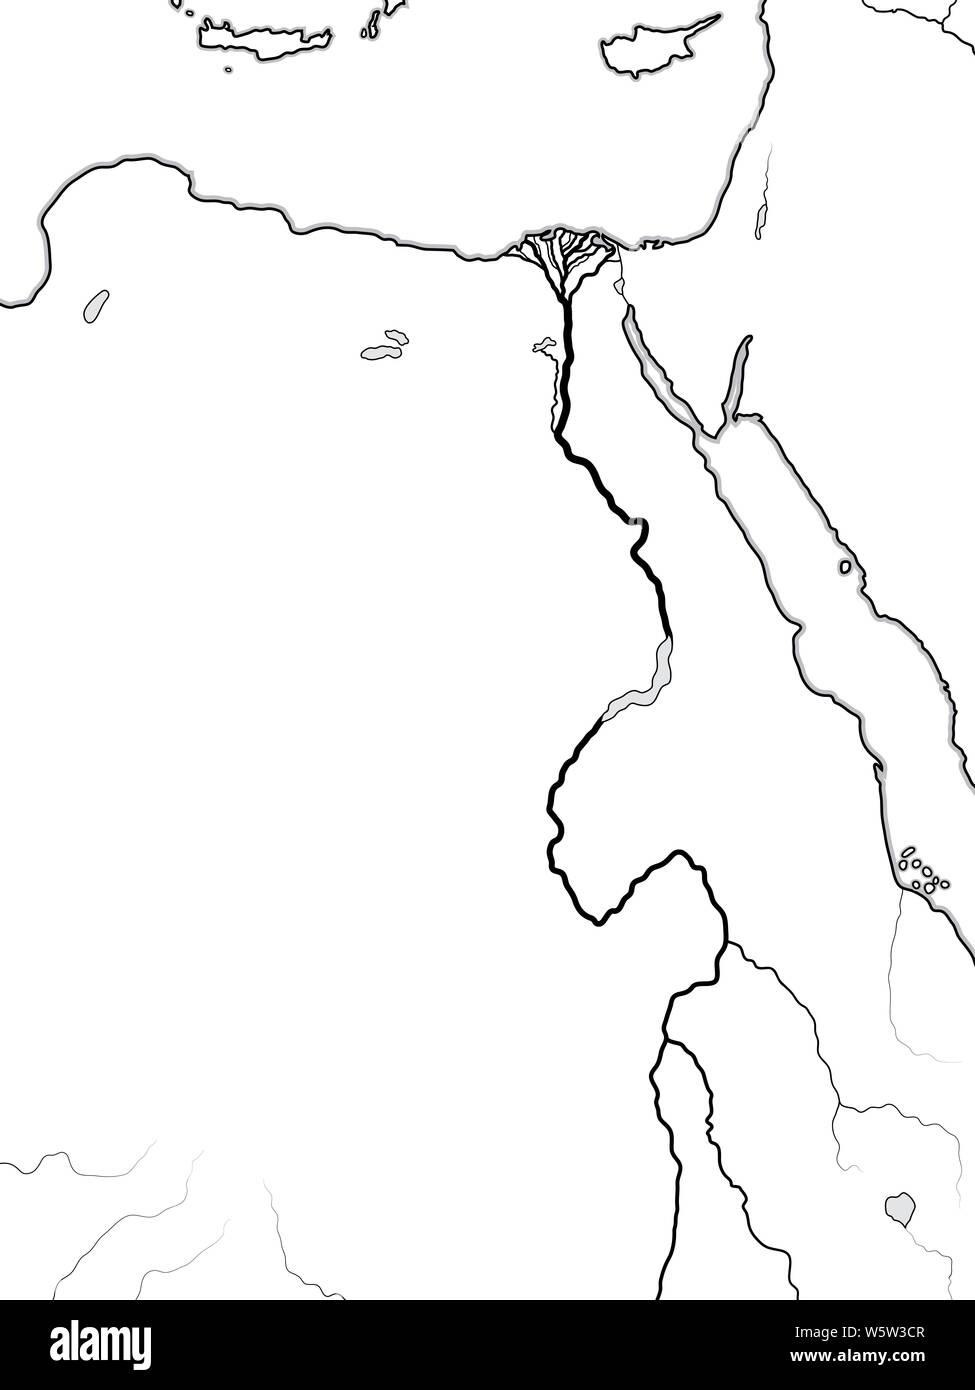 Karte ägypten Nil.Welt Karte Von ägypten Nubien Libyen Afrika ägypten Libyen